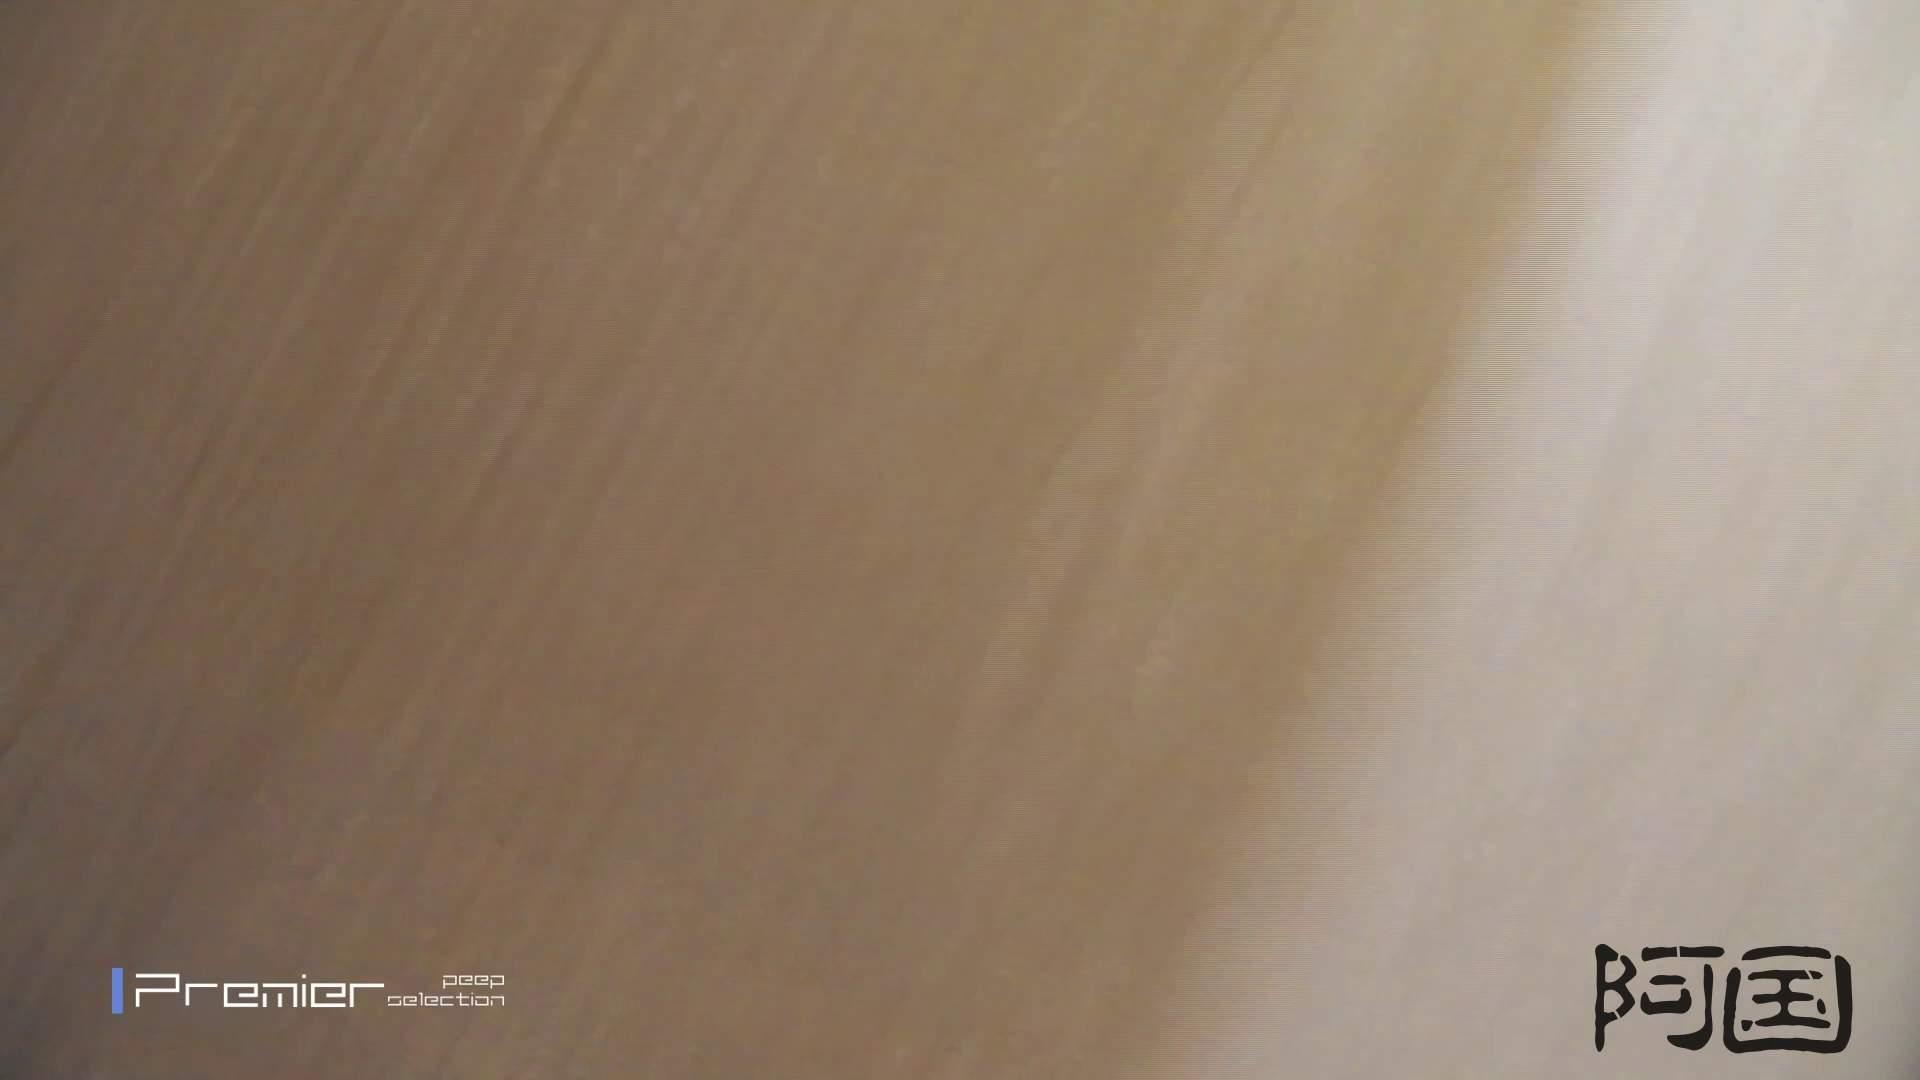 和式洋式七変化 Vol.34 最終作、 シリーズ最高の美人登場 洗面所 | 美人  91pic 1